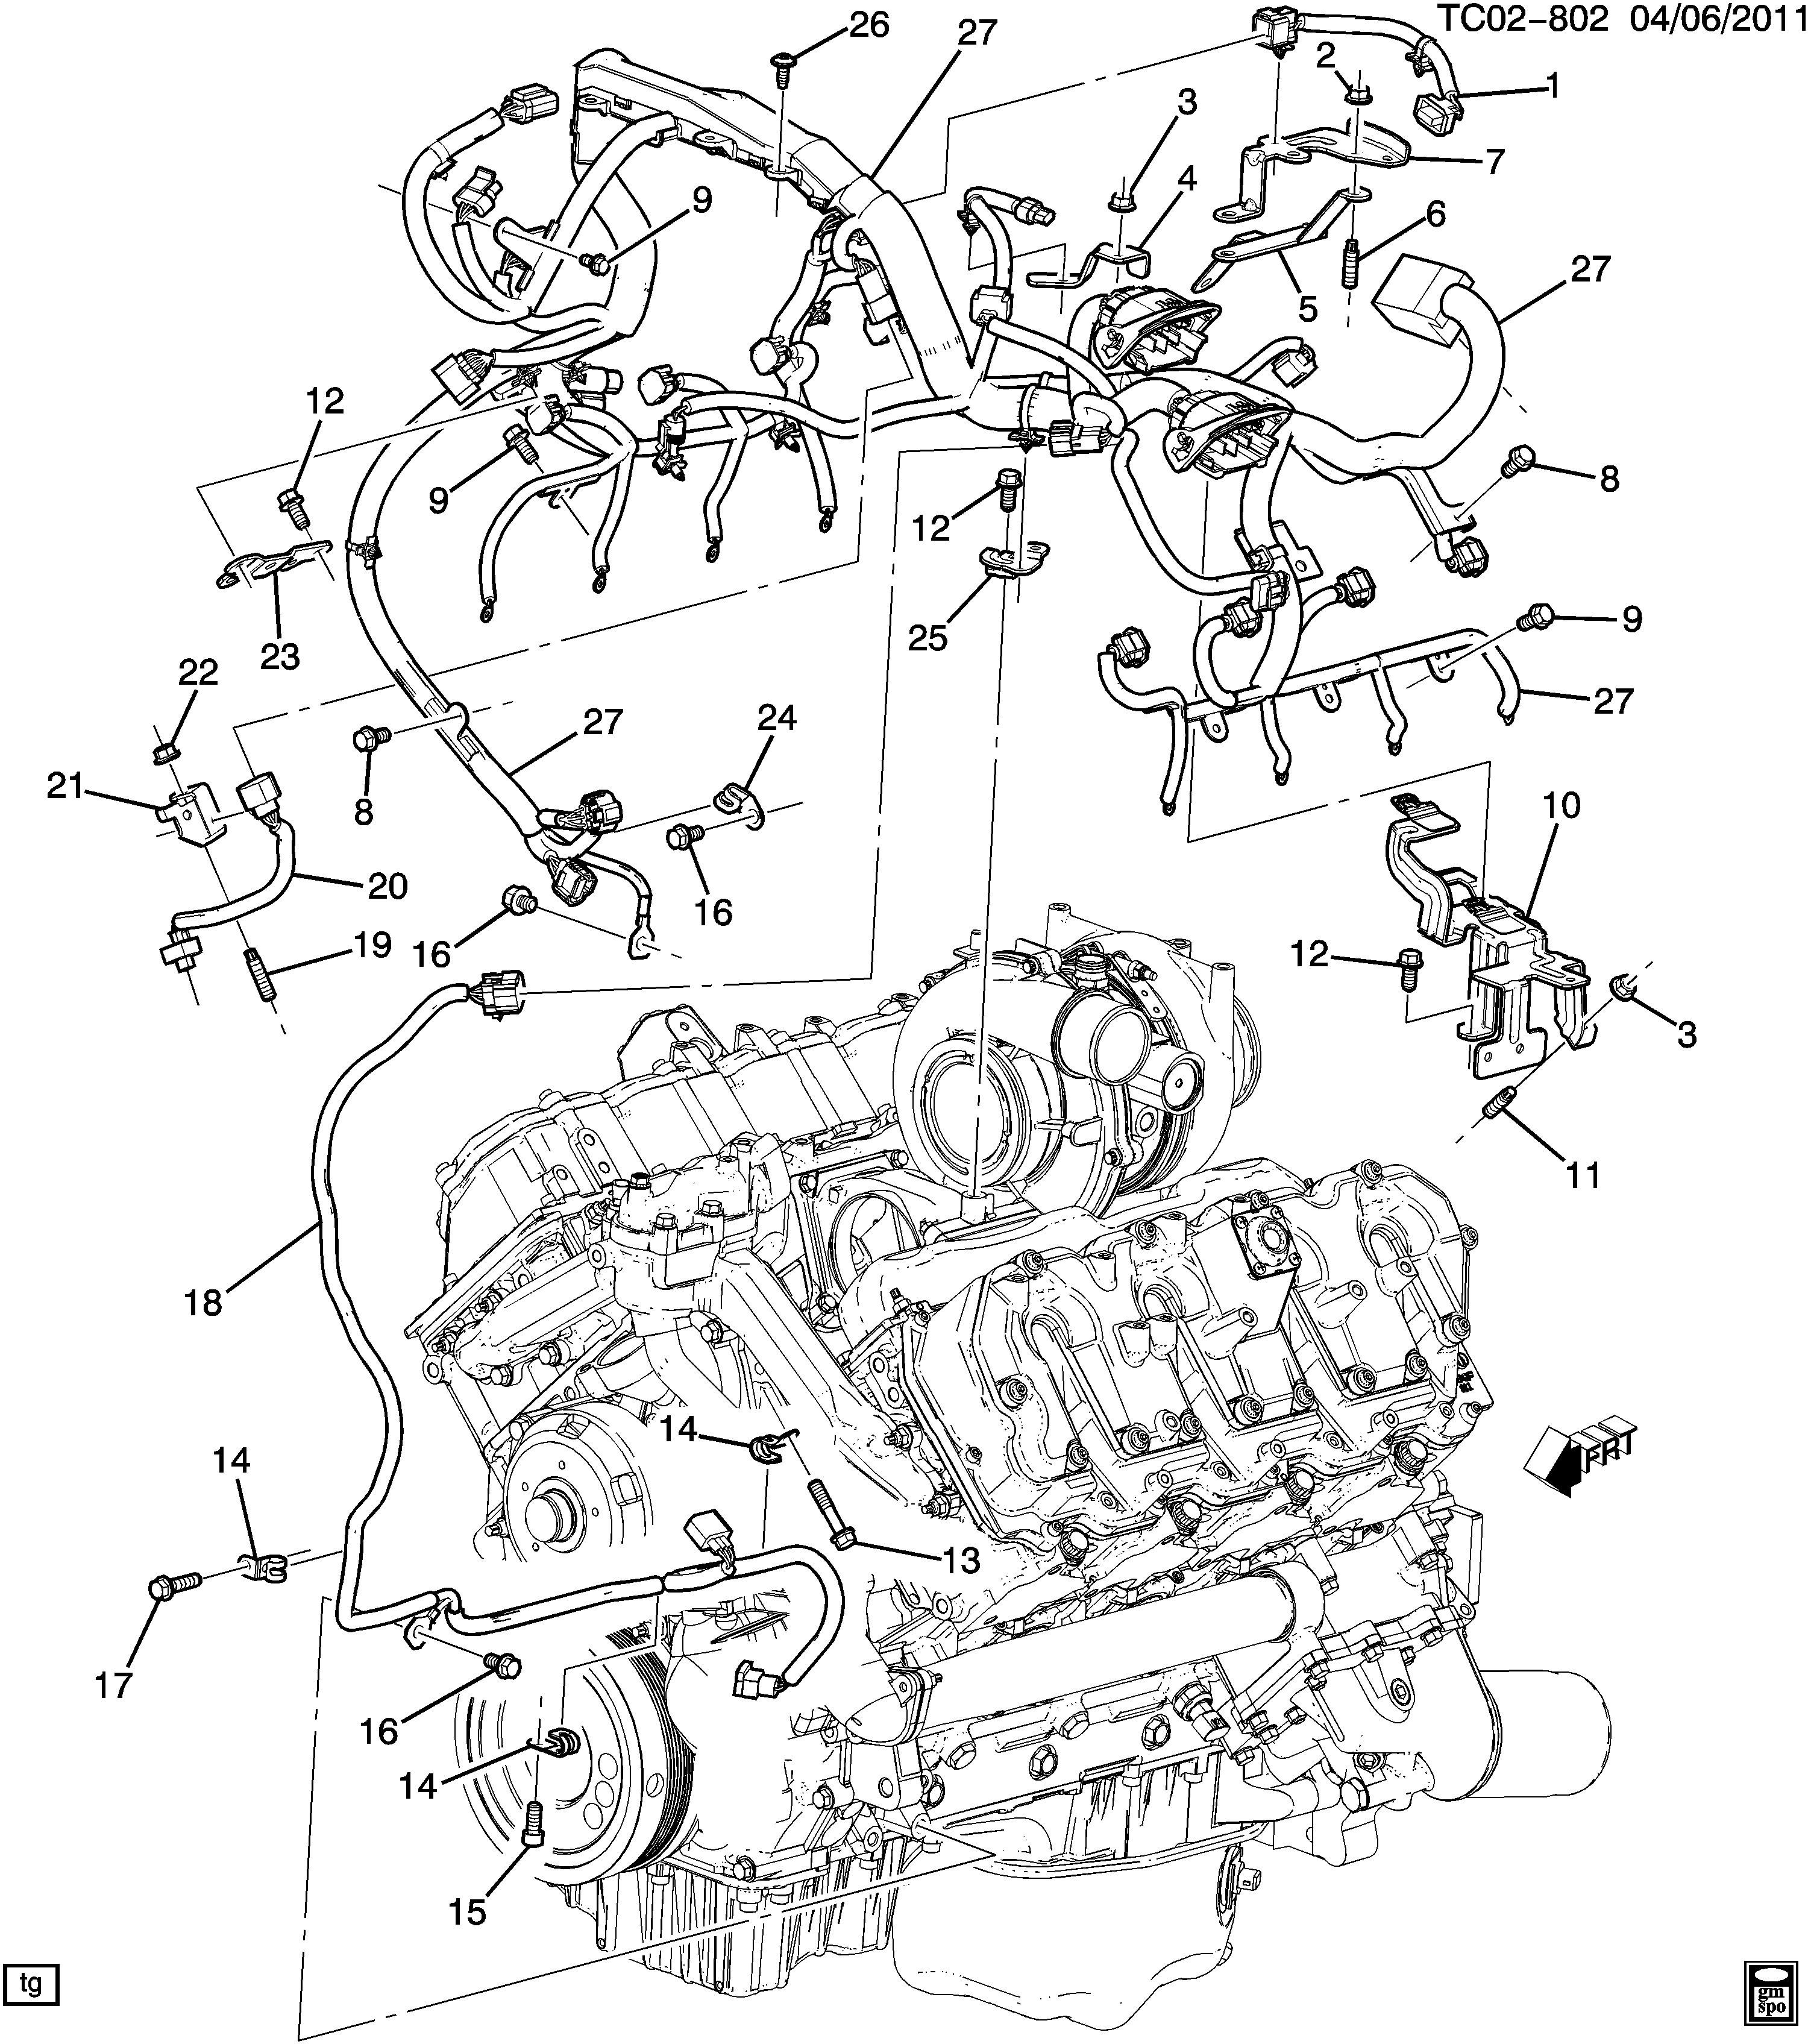 Lb7 Duramax Engine Diagram List Lb7 Glow Plug Relay Wiring Diagram Edmyedguide24 Of Lb7 Duramax Engine Diagram